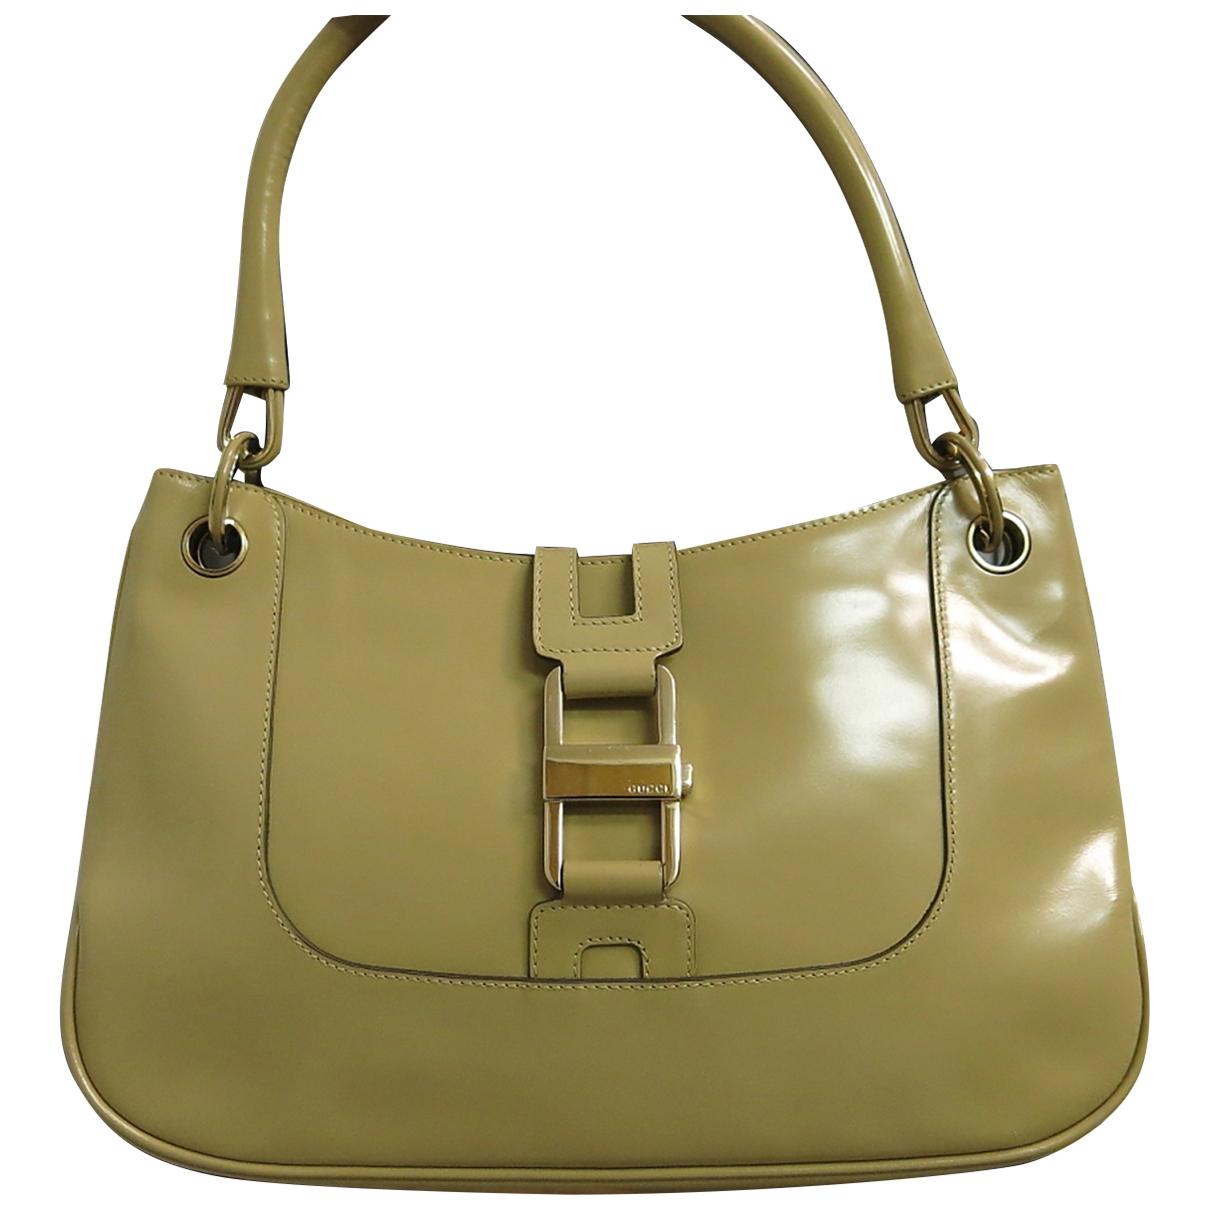 Gucci \N Green Leather handbag for Women \N